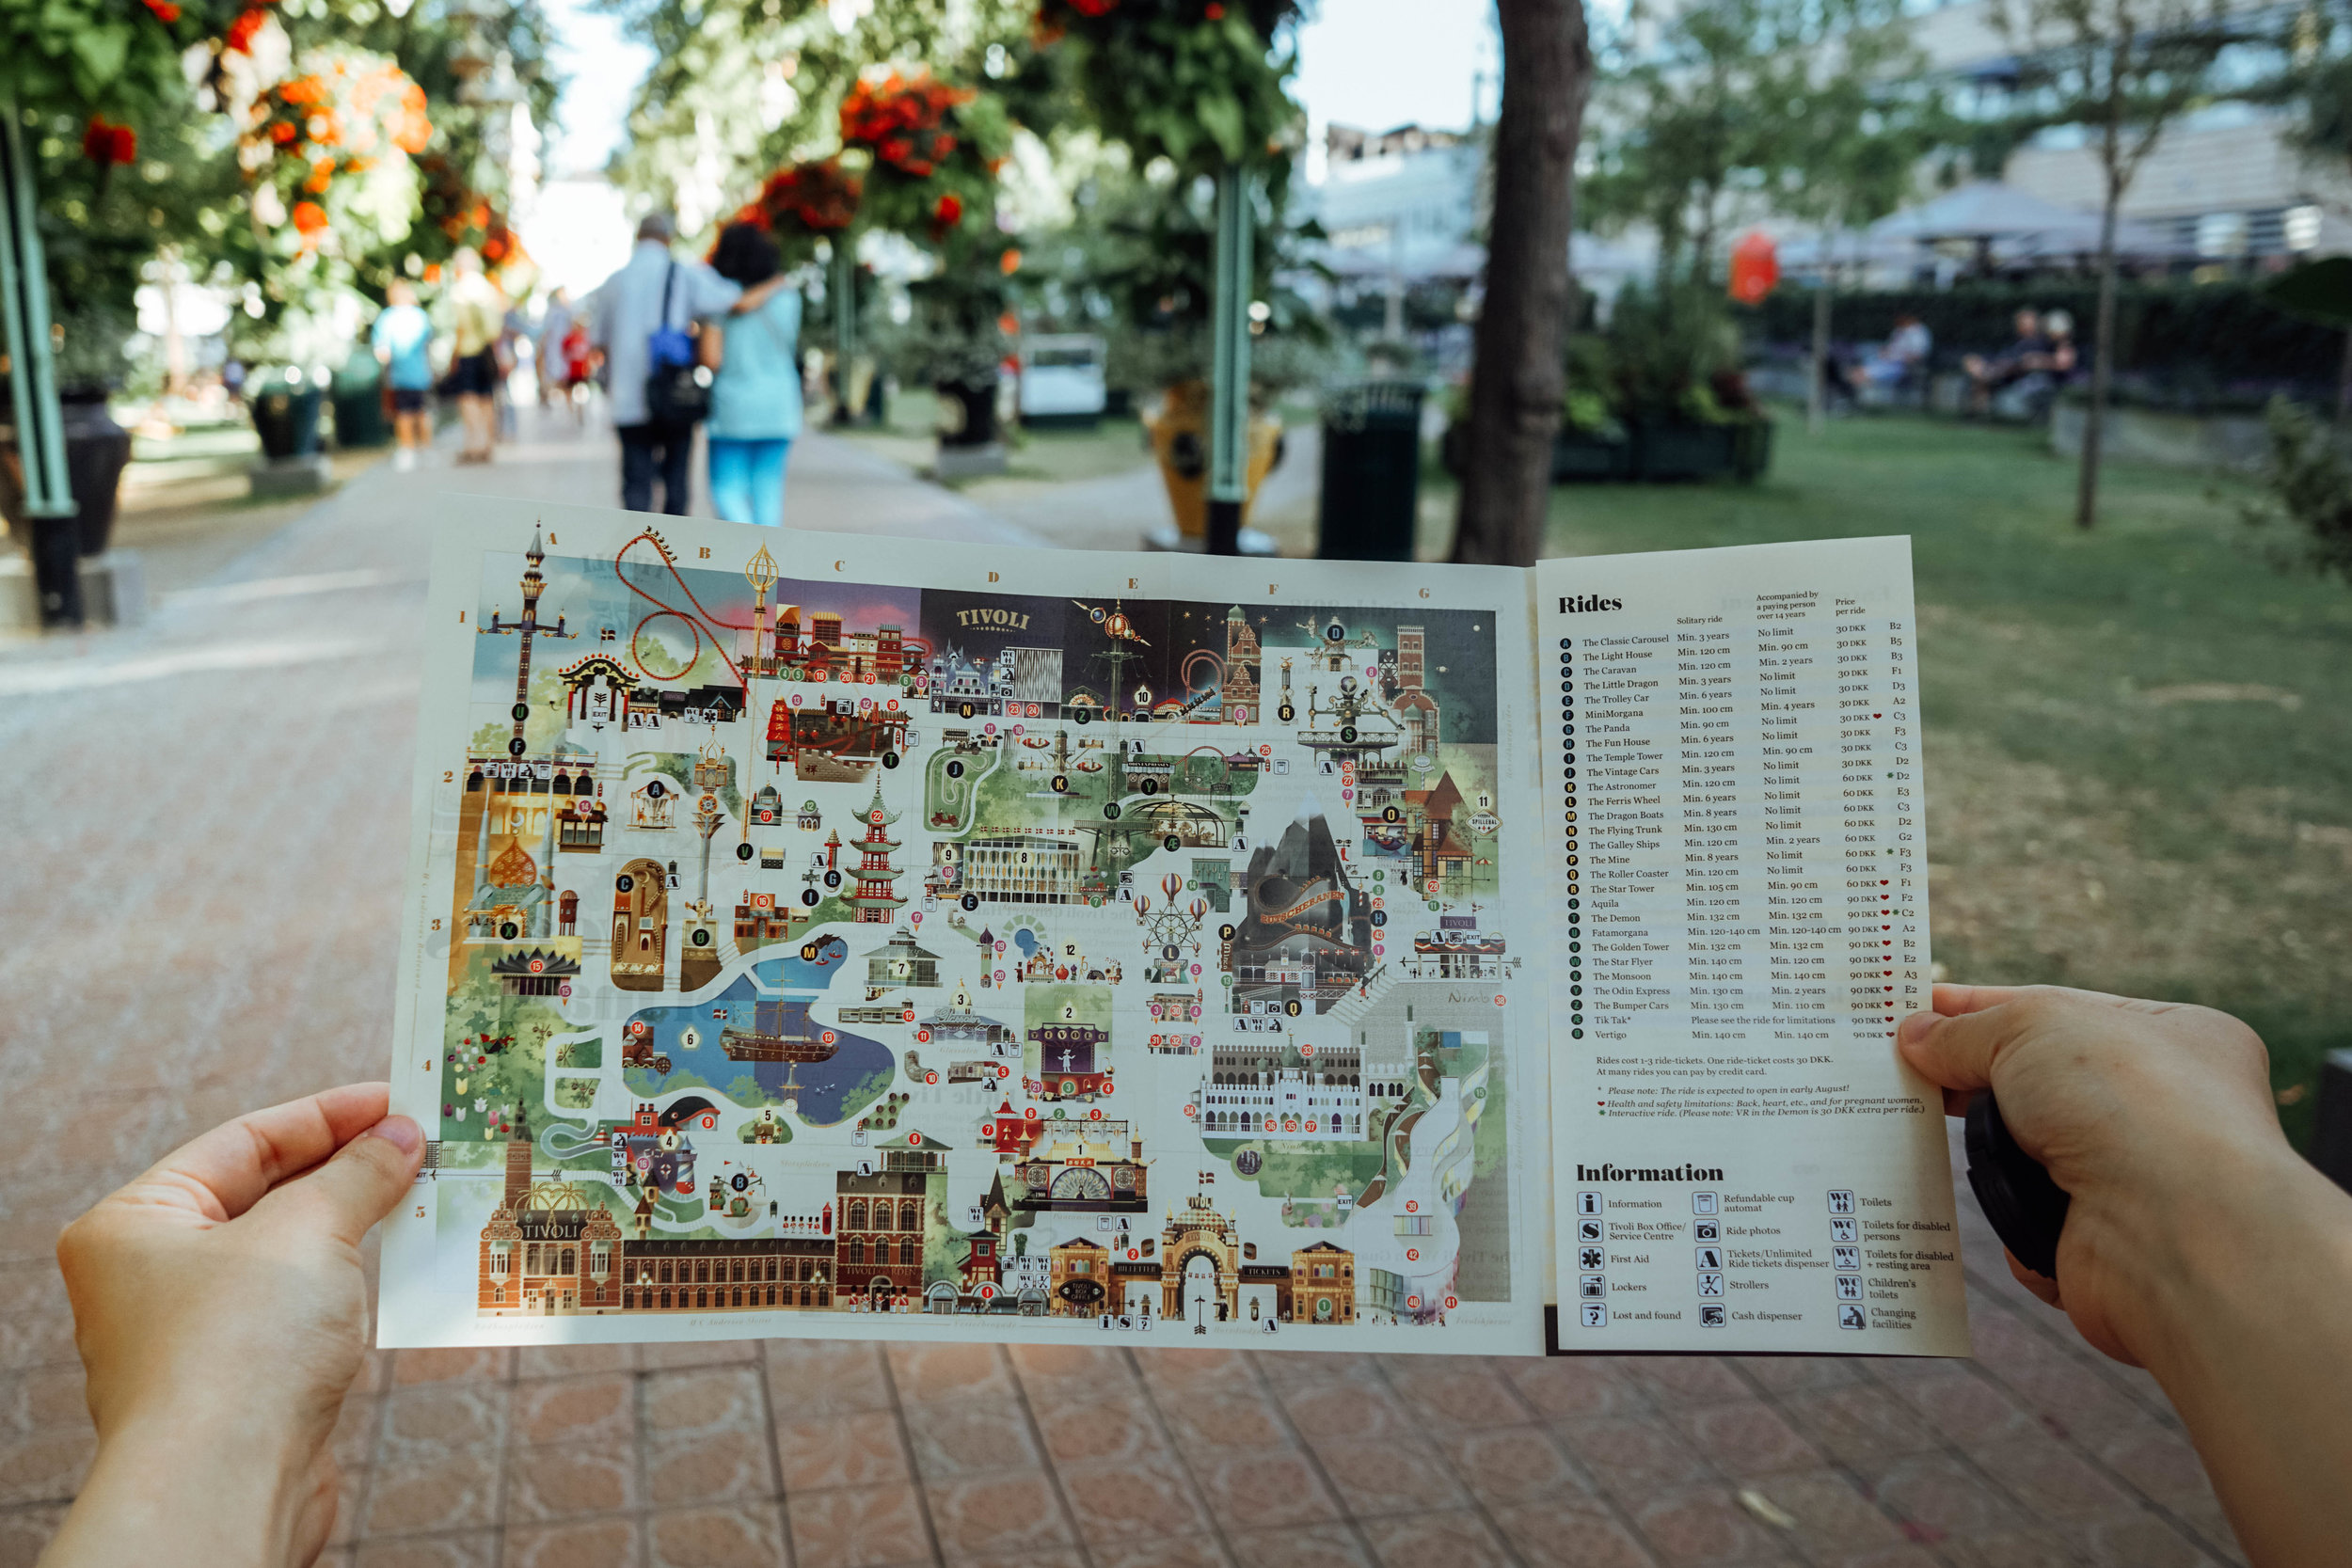 A map of Tivoli!